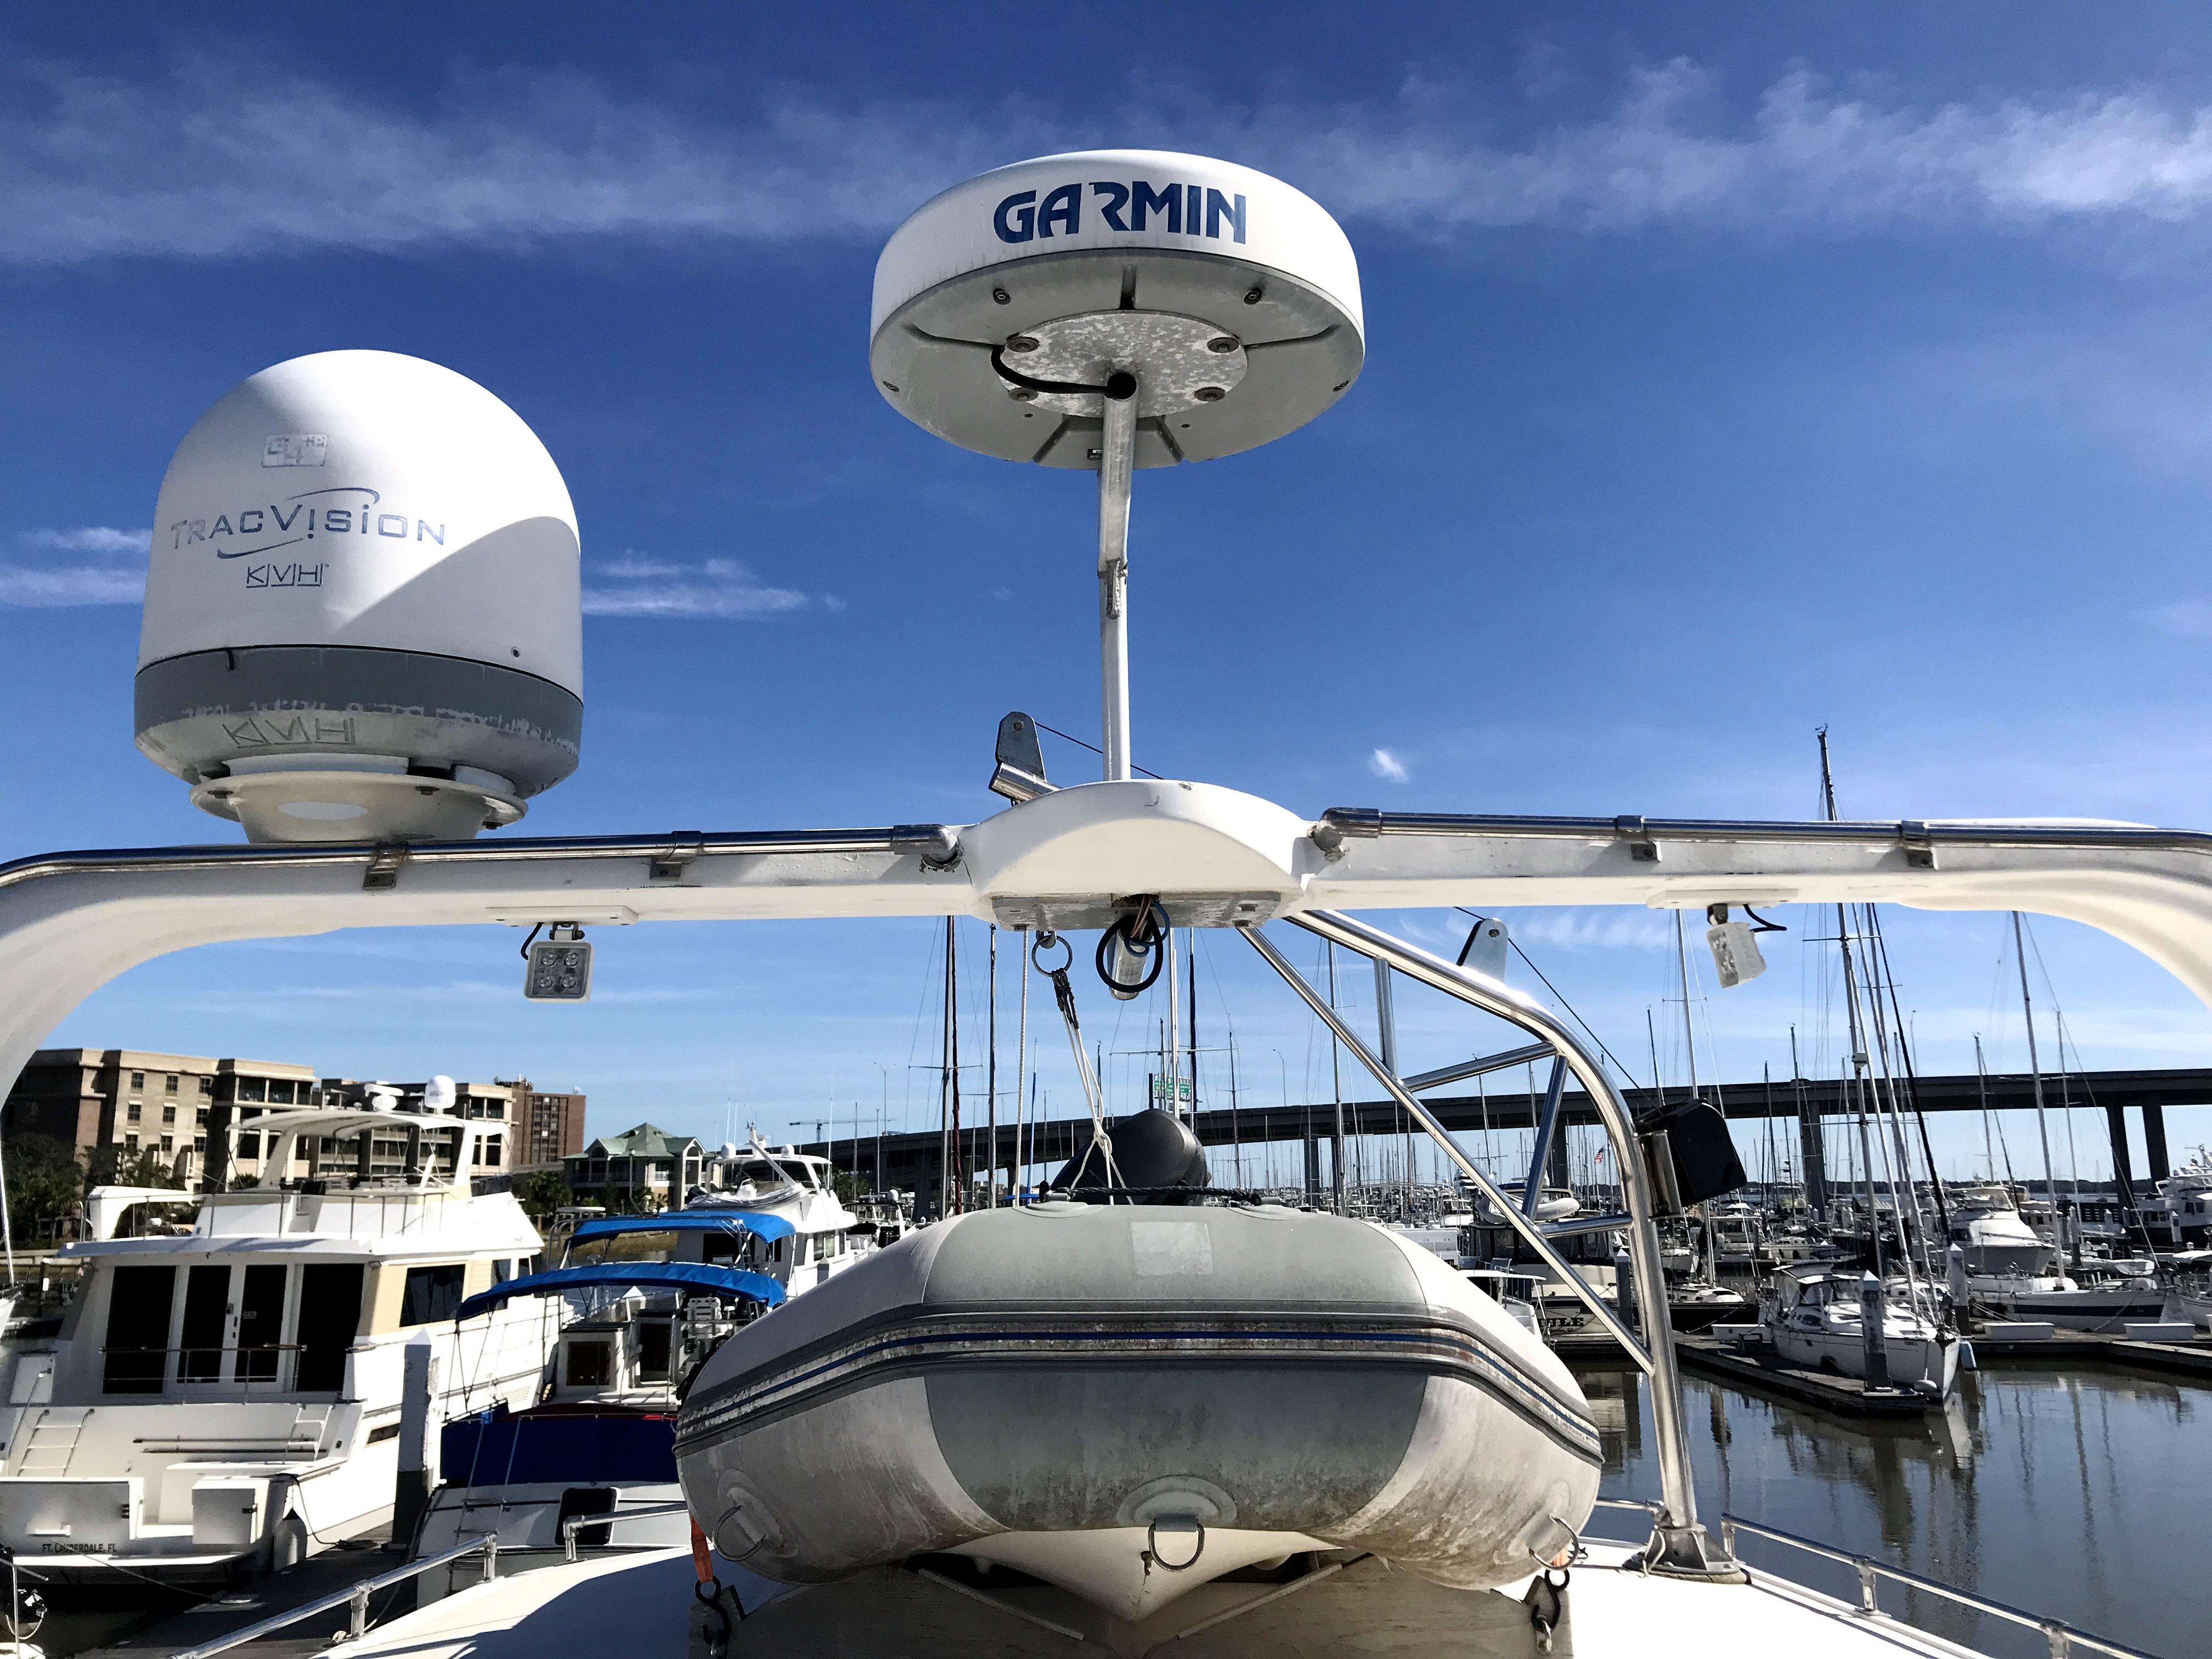 Sea Ranger SUNDECK - dinghy, Garmin radar, and KVH Tracvision